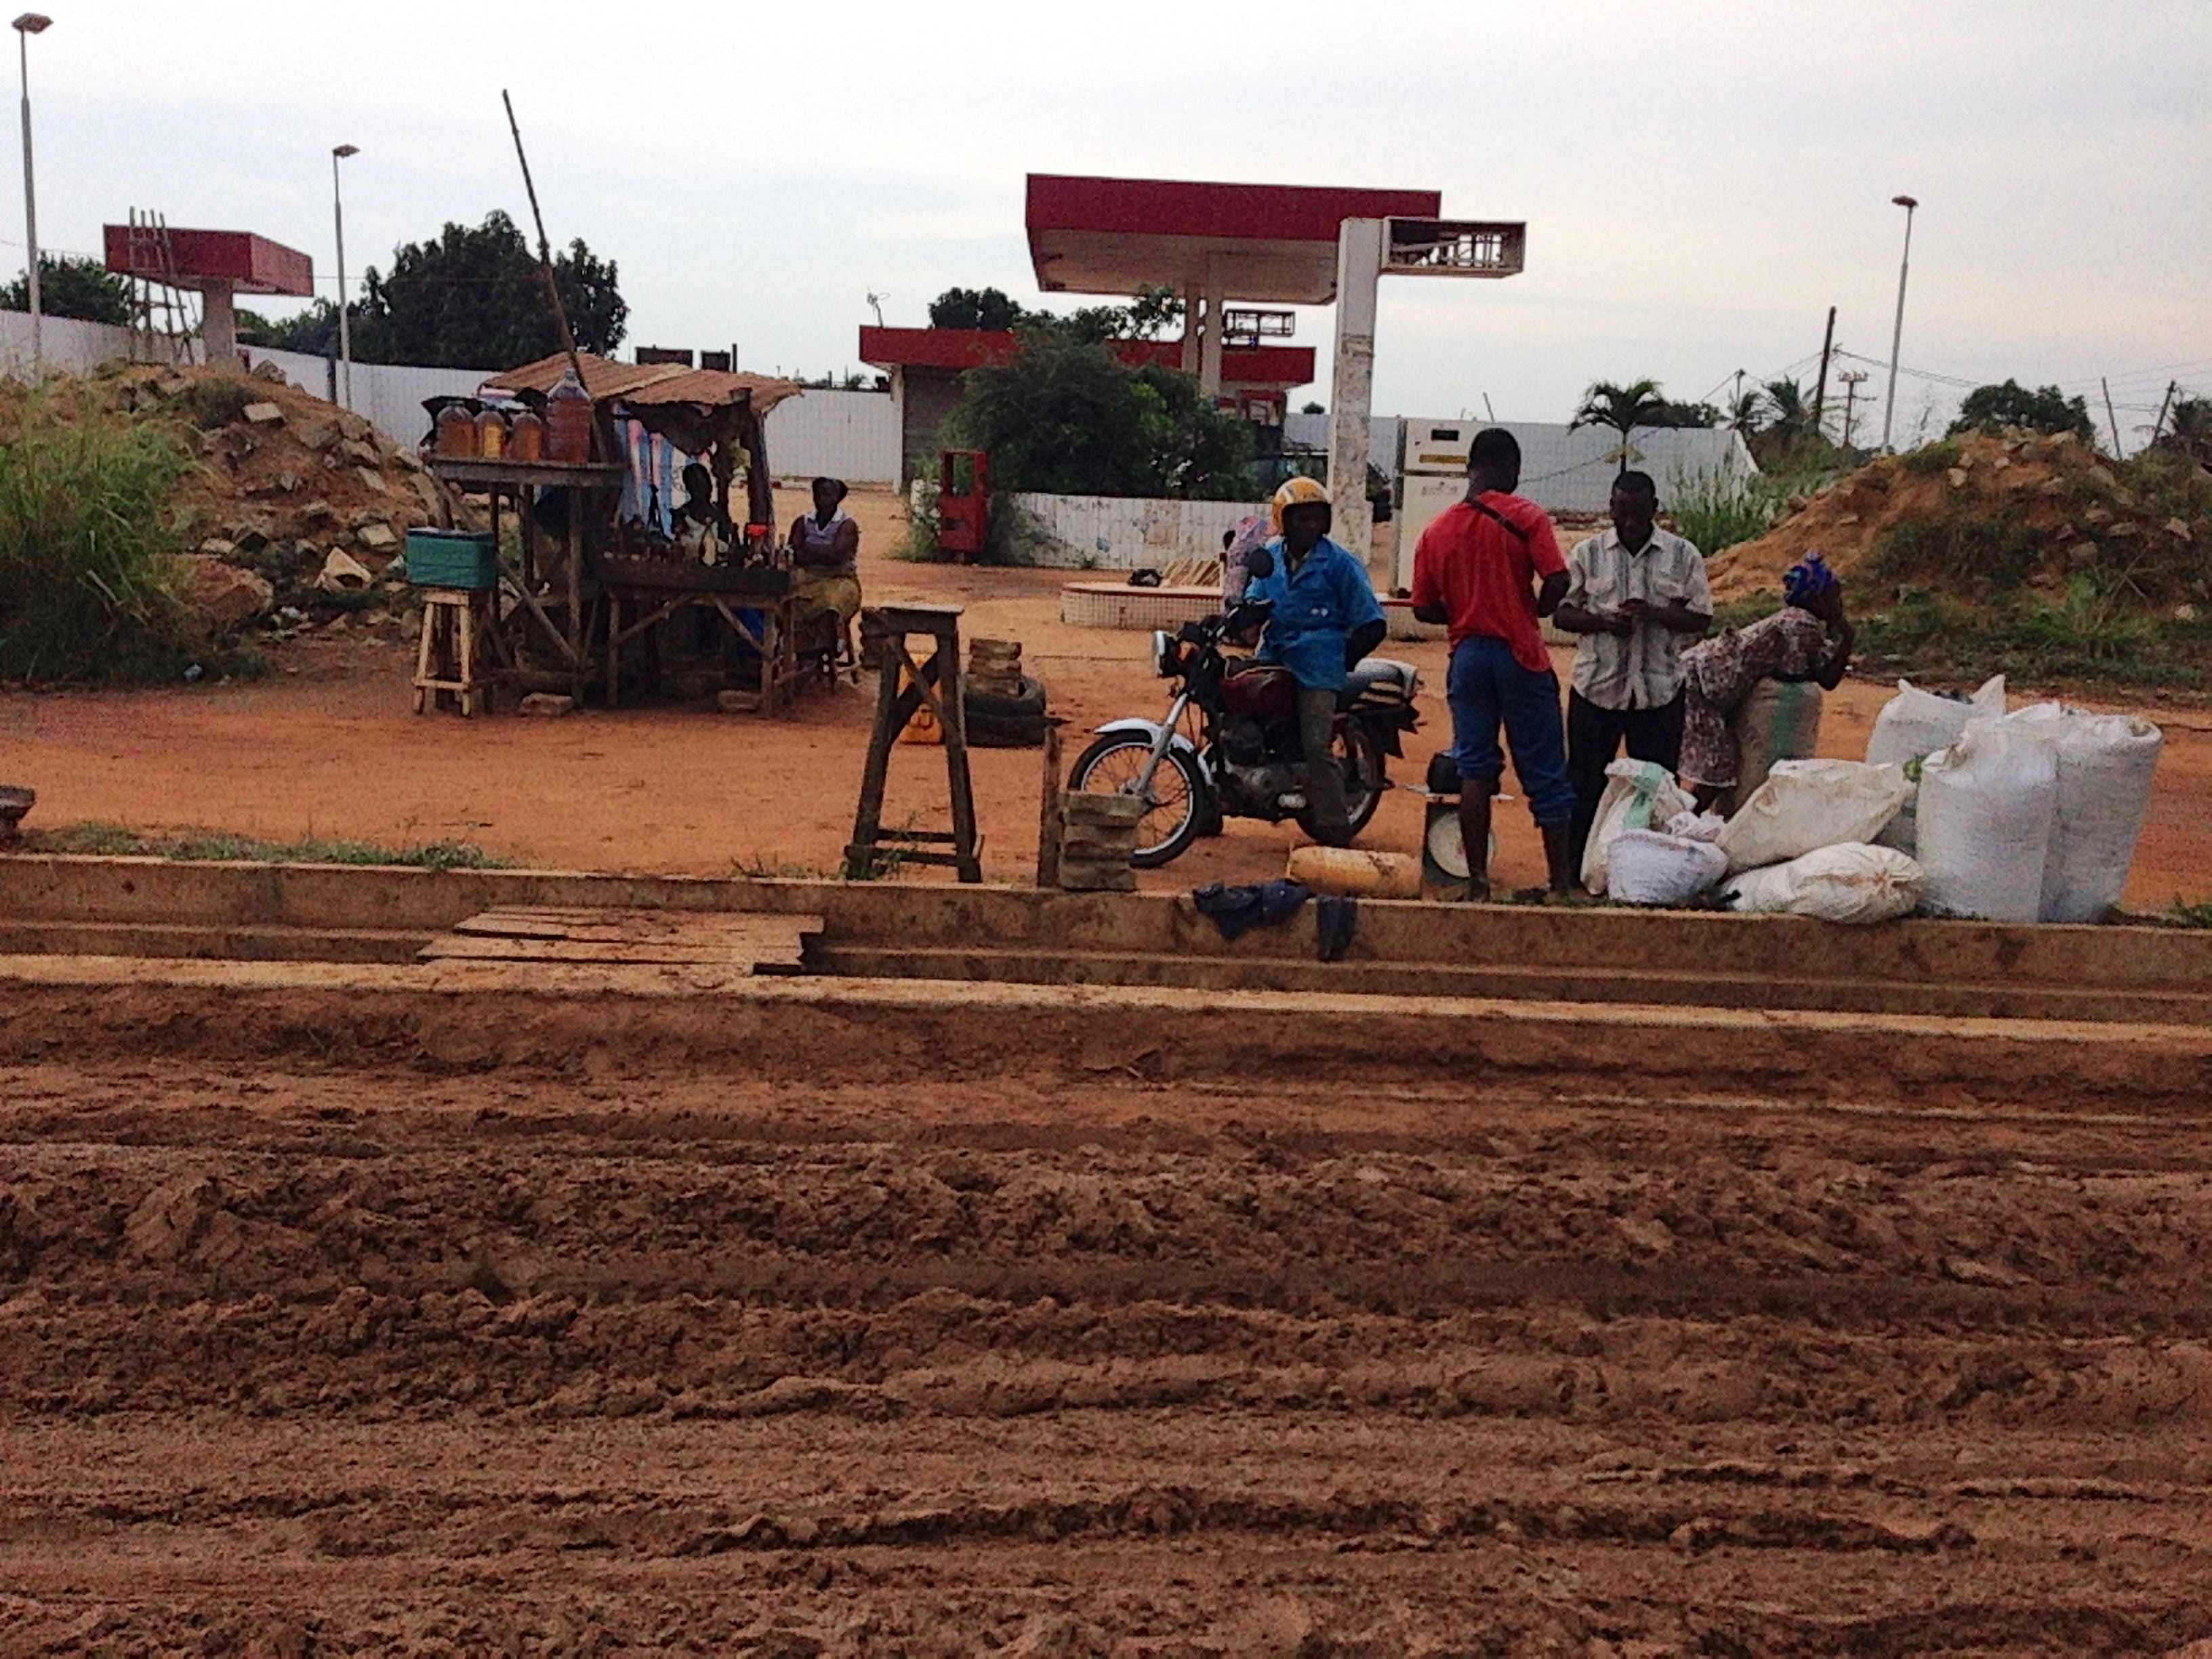 Quidah, Atlantique Department, Benin. #JujuFilms